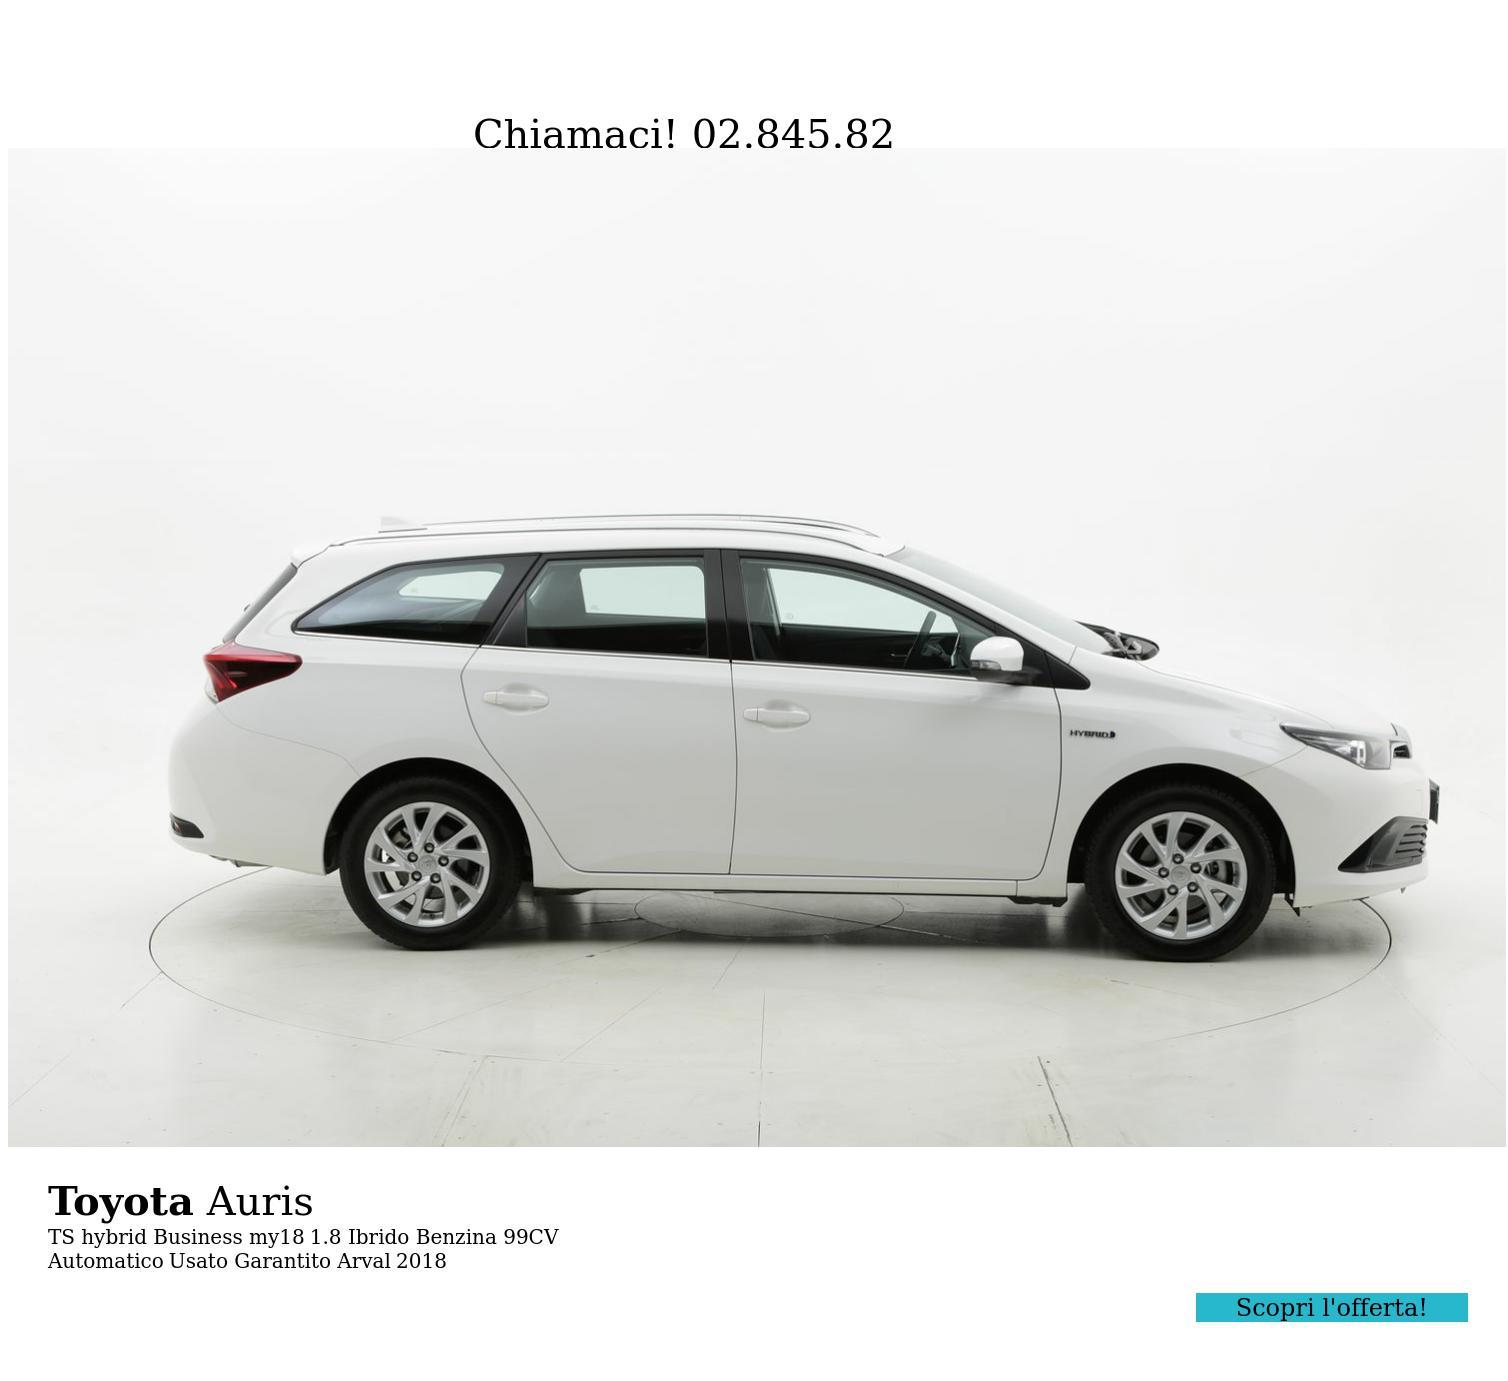 Toyota Auris TS hybrid Business my18 km 0 ibrido benzina bianca | brumbrum